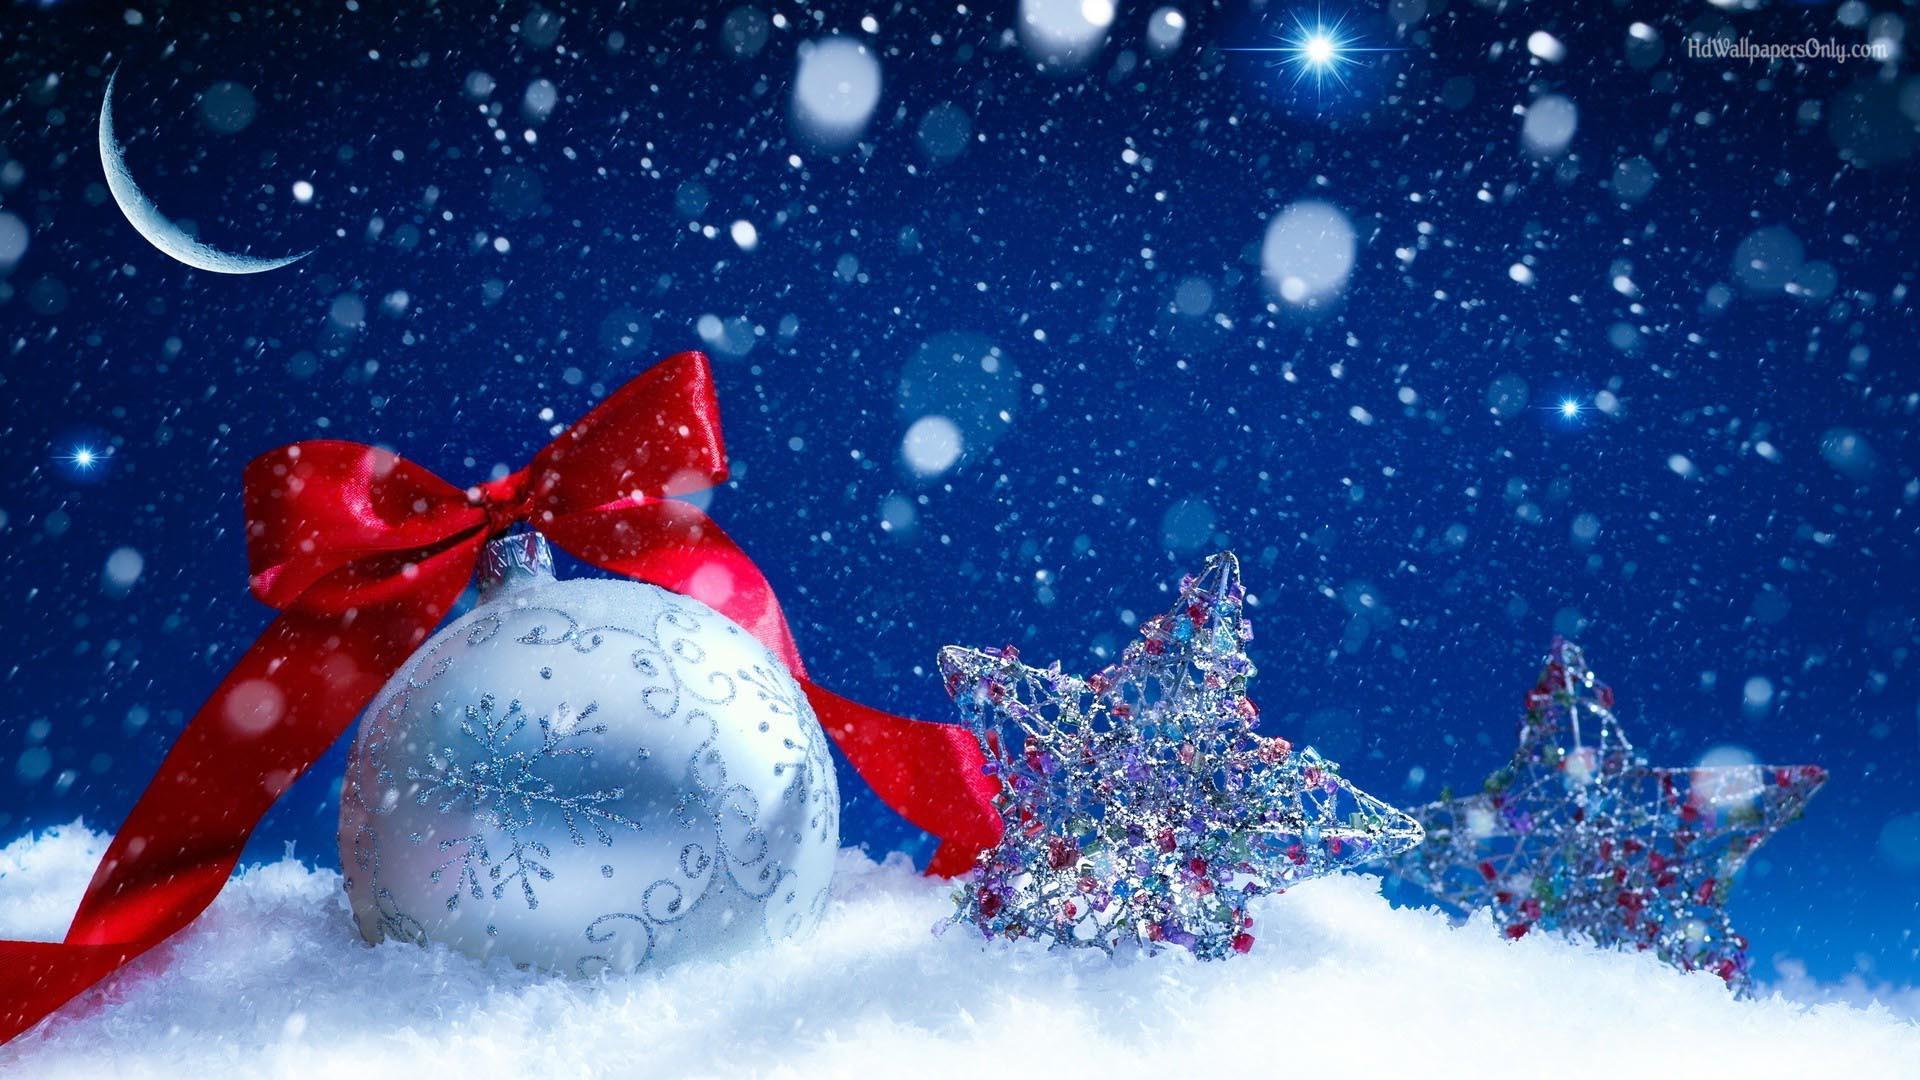 Winter Christmas Wallpapers 1080p On Hd Wallpaper - Winter ...